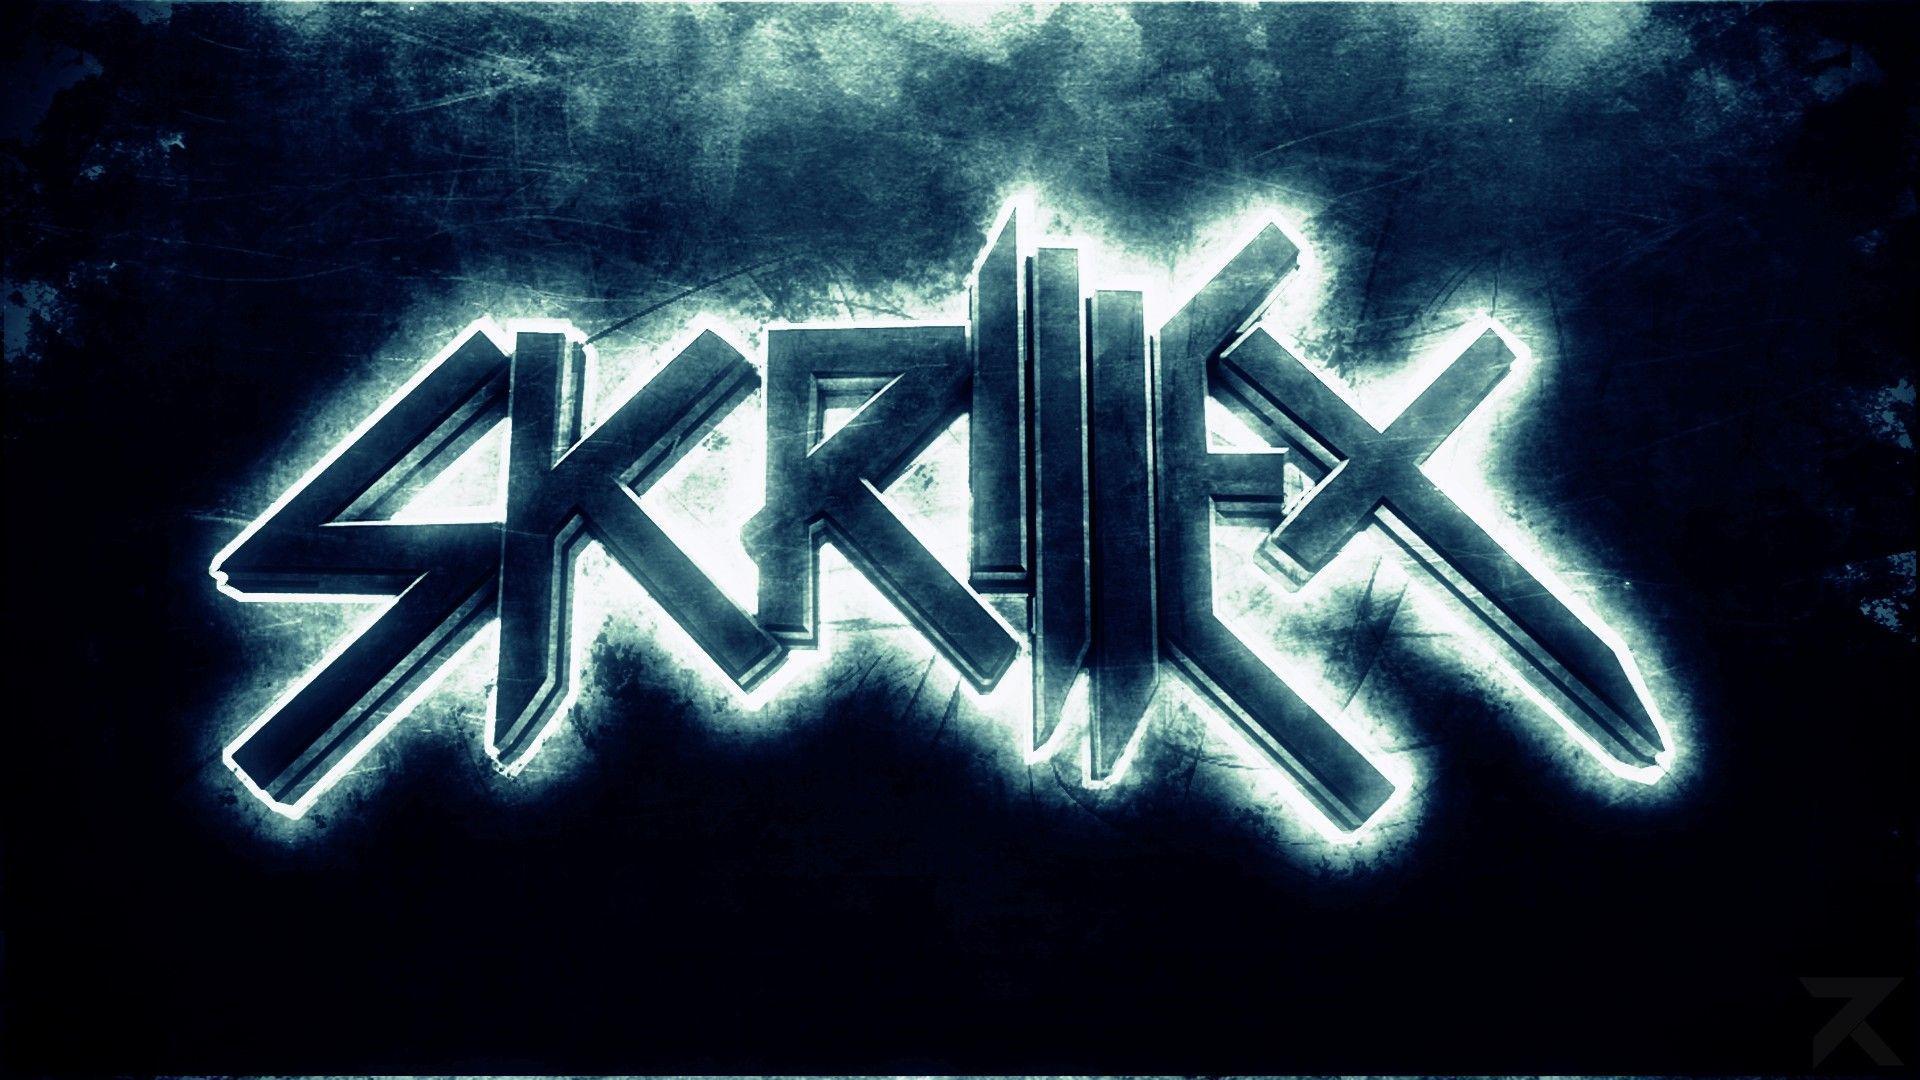 Cool Skrillex Wallpapers Top Free Cool Skrillex Backgrounds